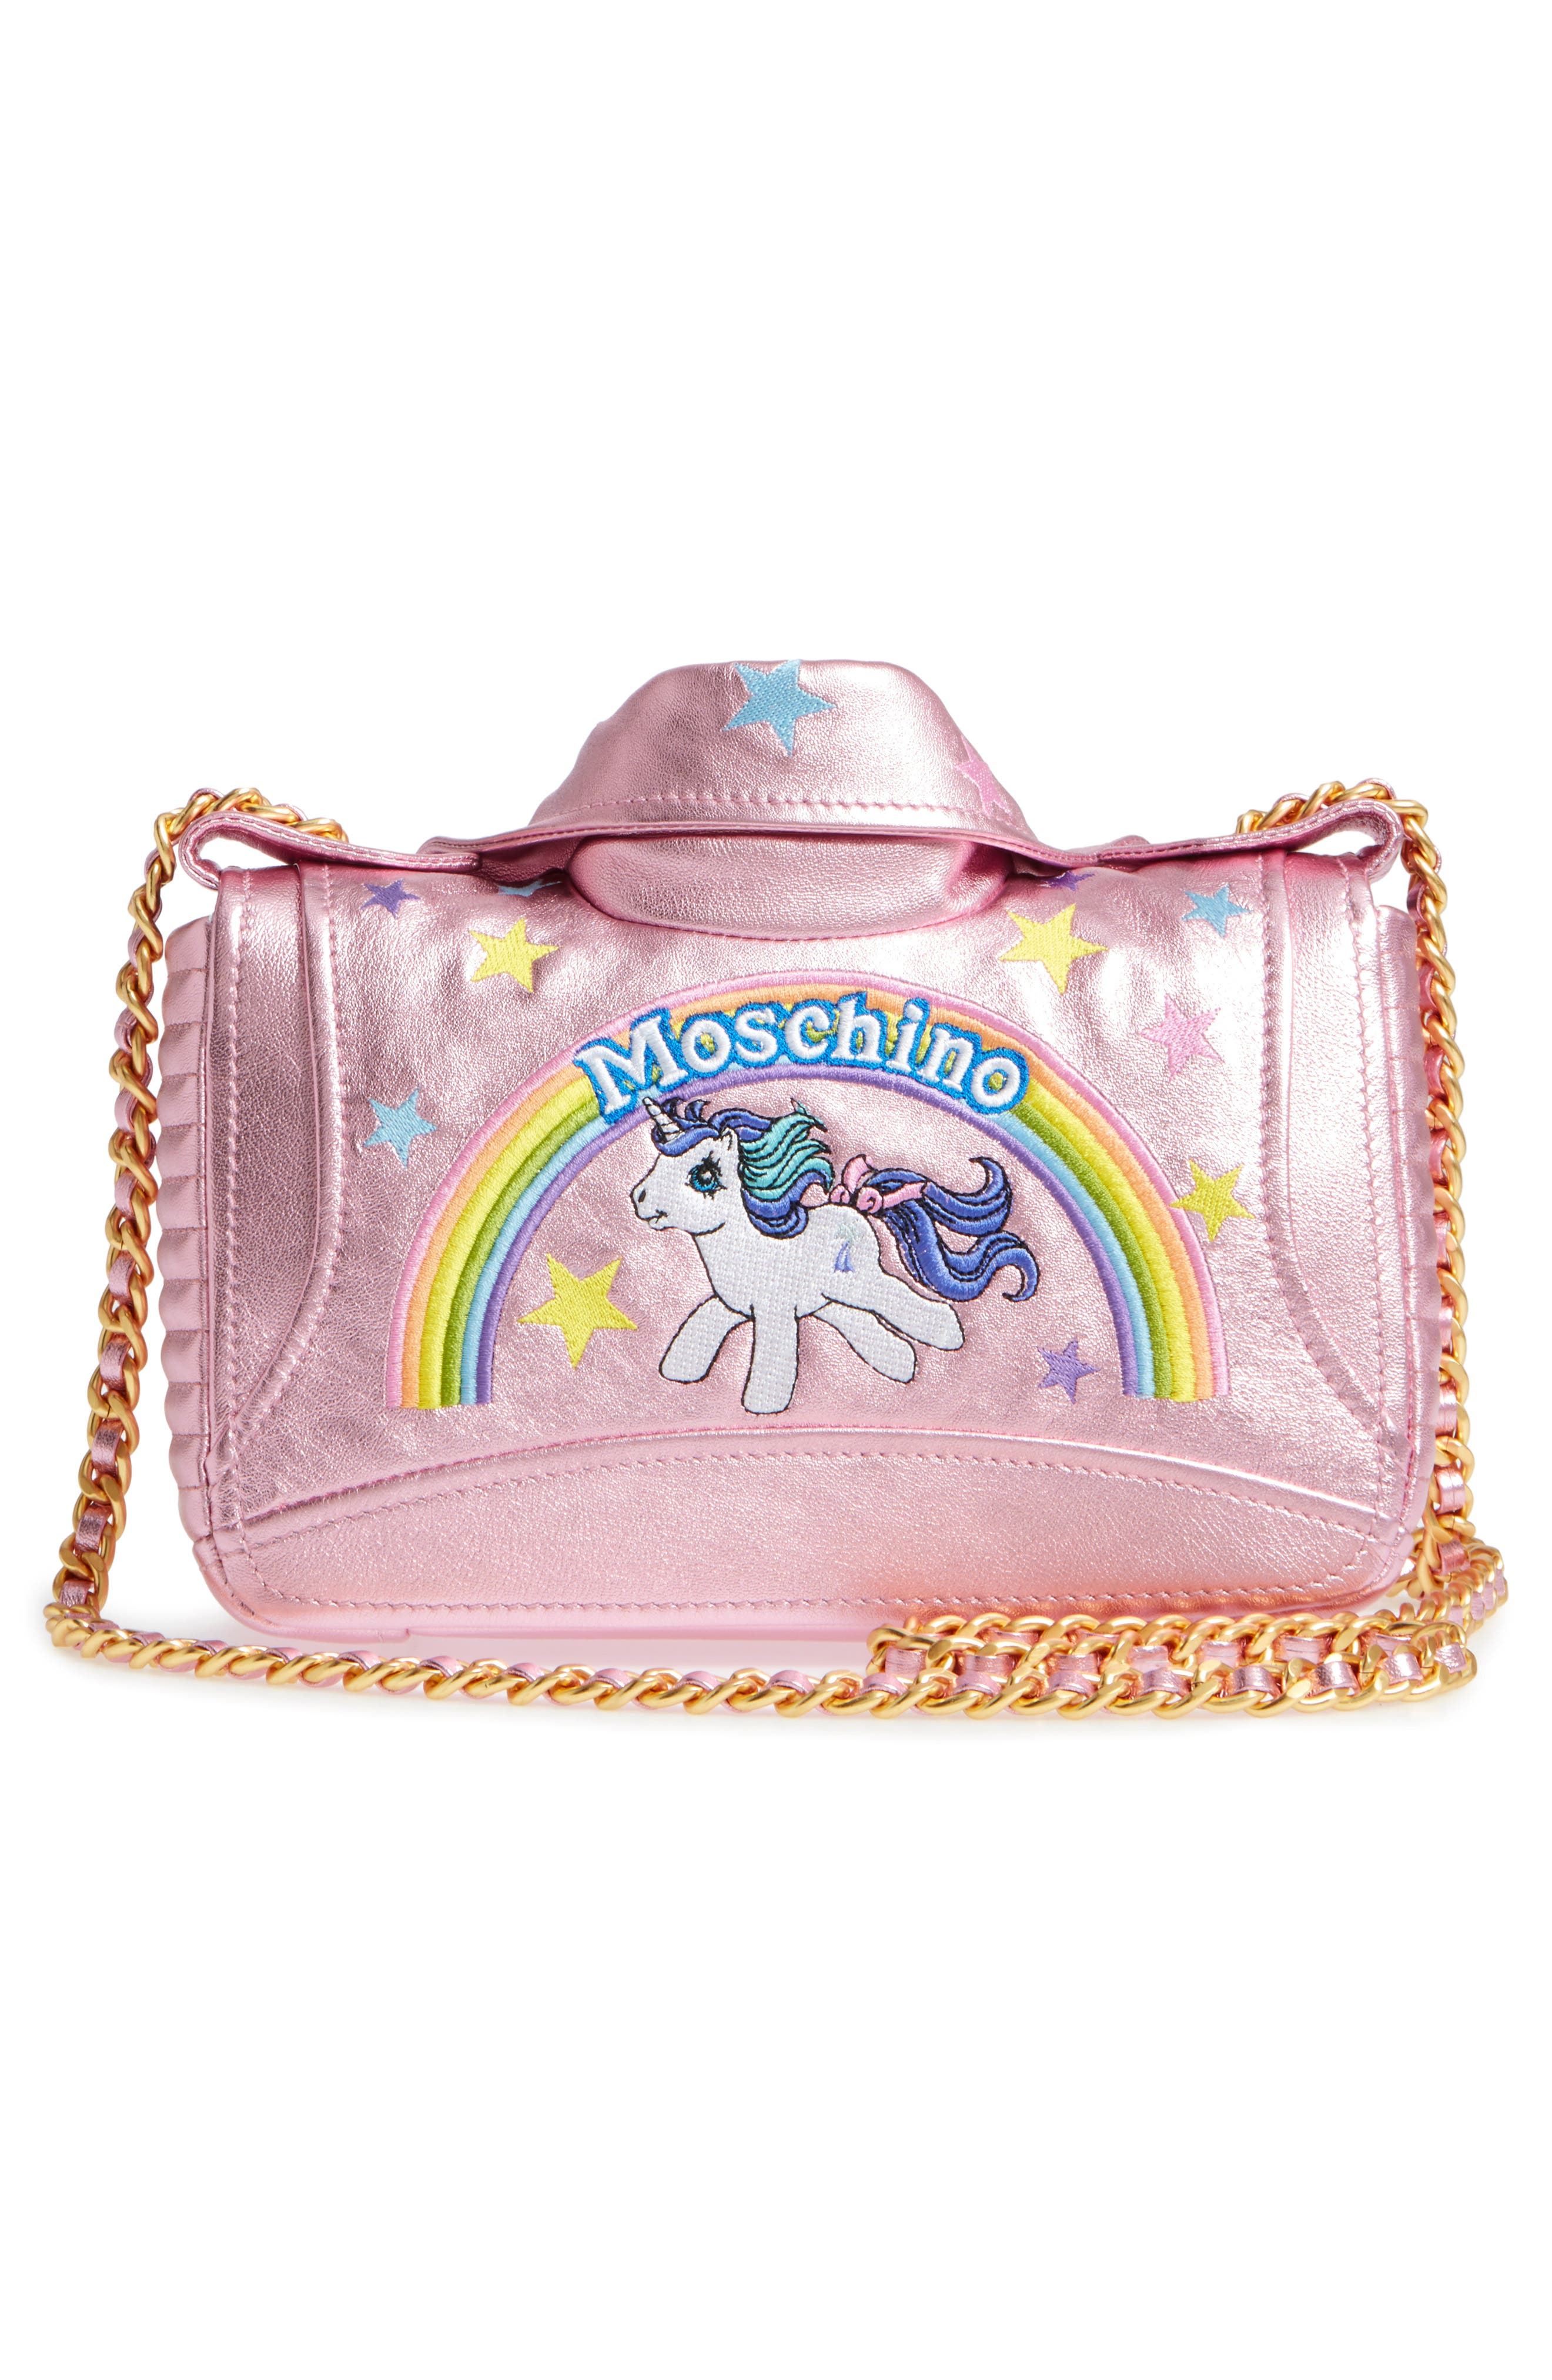 x My Little Pony Biker Jacket Metallic Leather Crossbody Bag,                             Alternate thumbnail 3, color,                             661